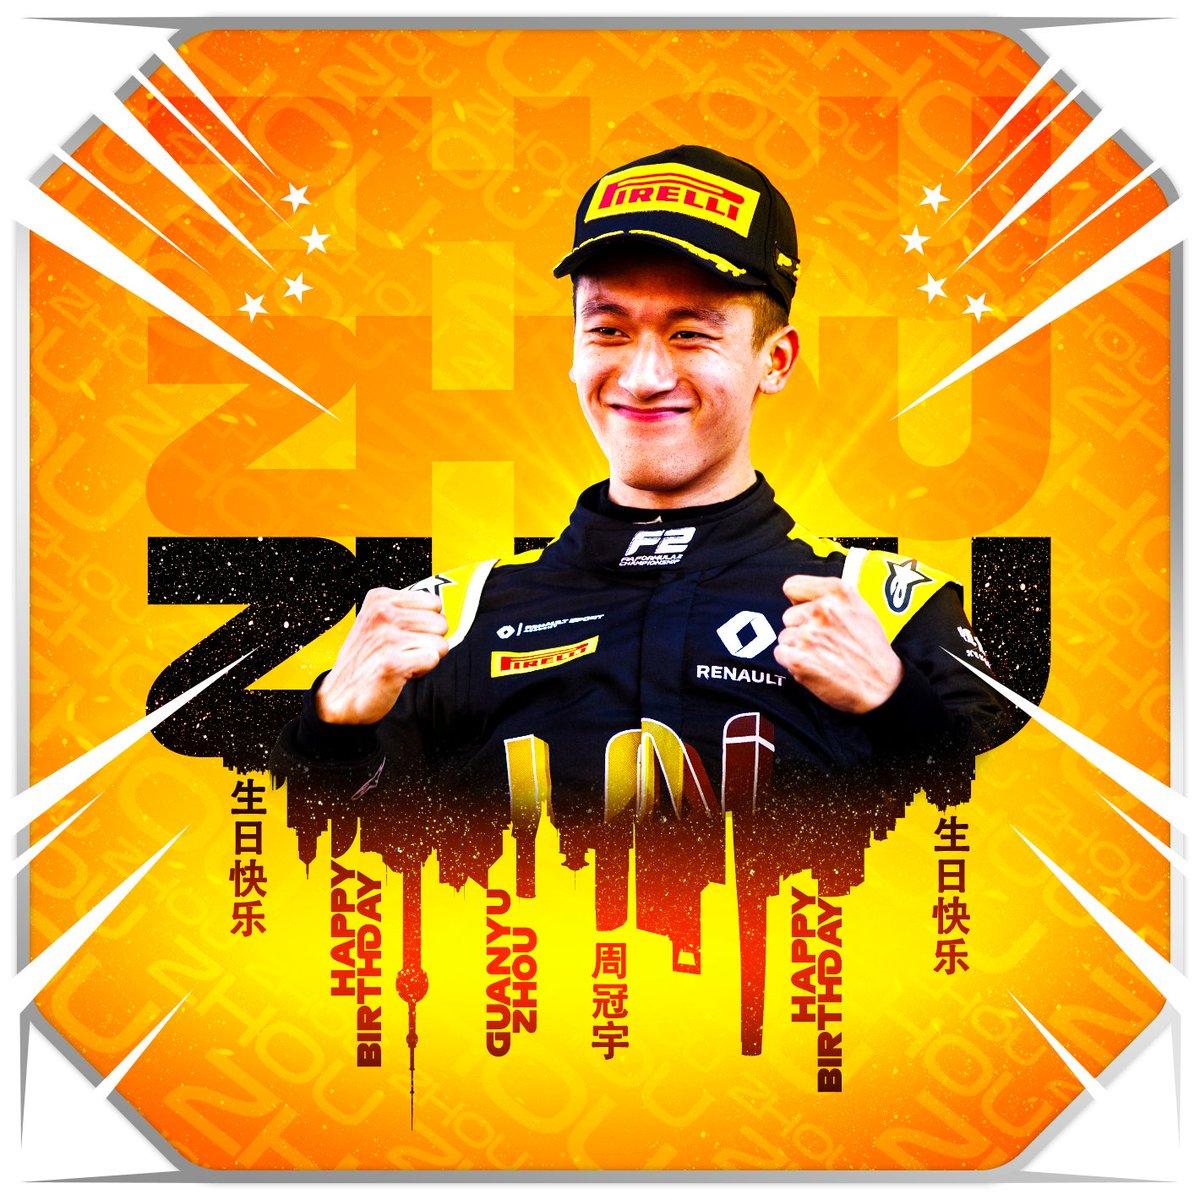 Happy Birthday, @gyzhou_33 🥳  The @VirtuosiRacing star turns 21 today! ✨  #F2 #RoadToF1 https://t.co/PrkXxk10hO